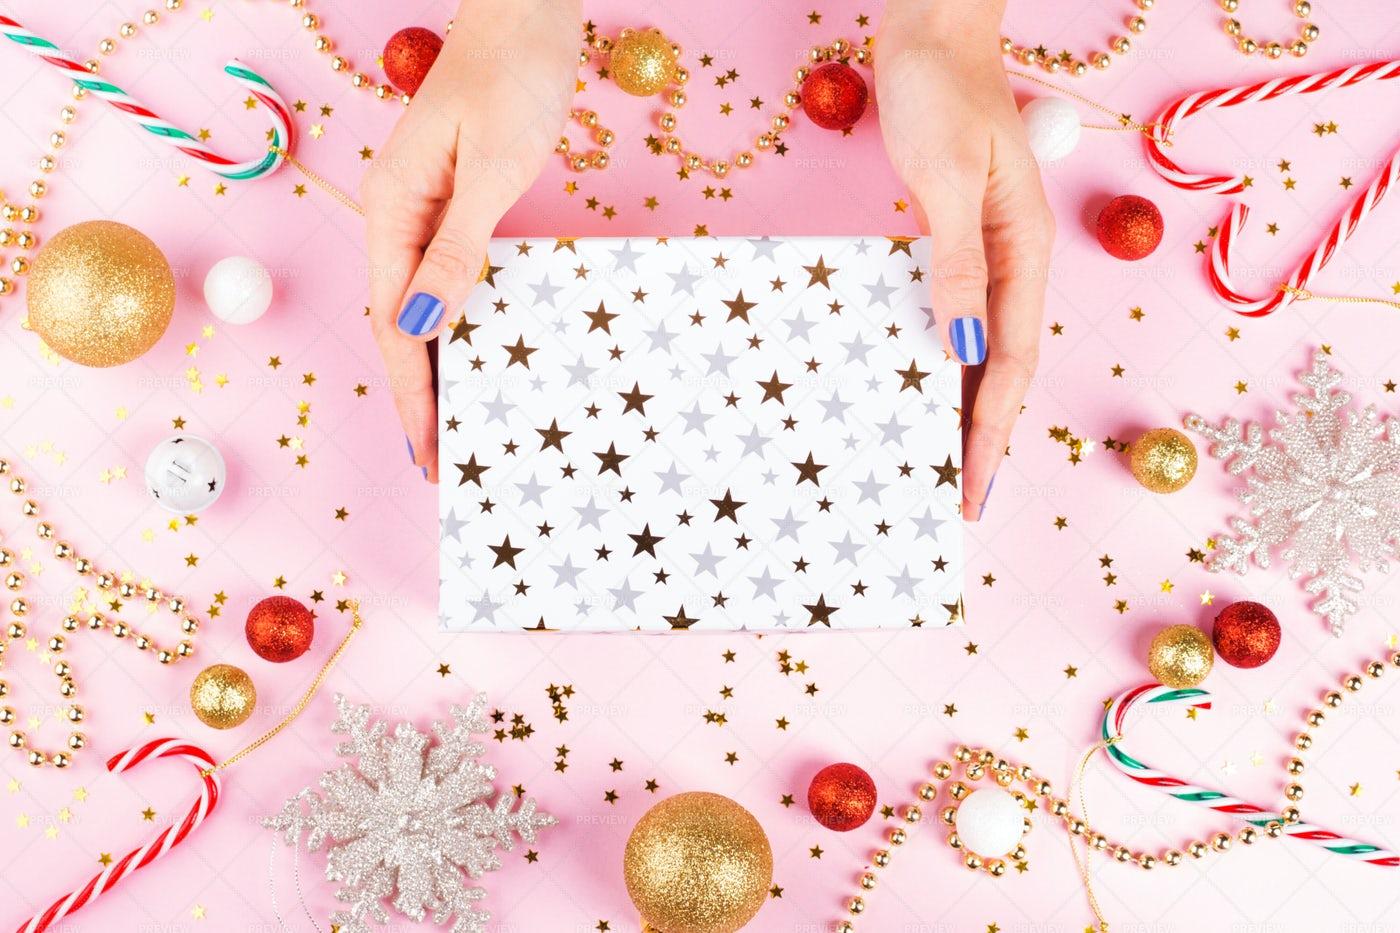 Christmas Ornament And Present: Stock Photos